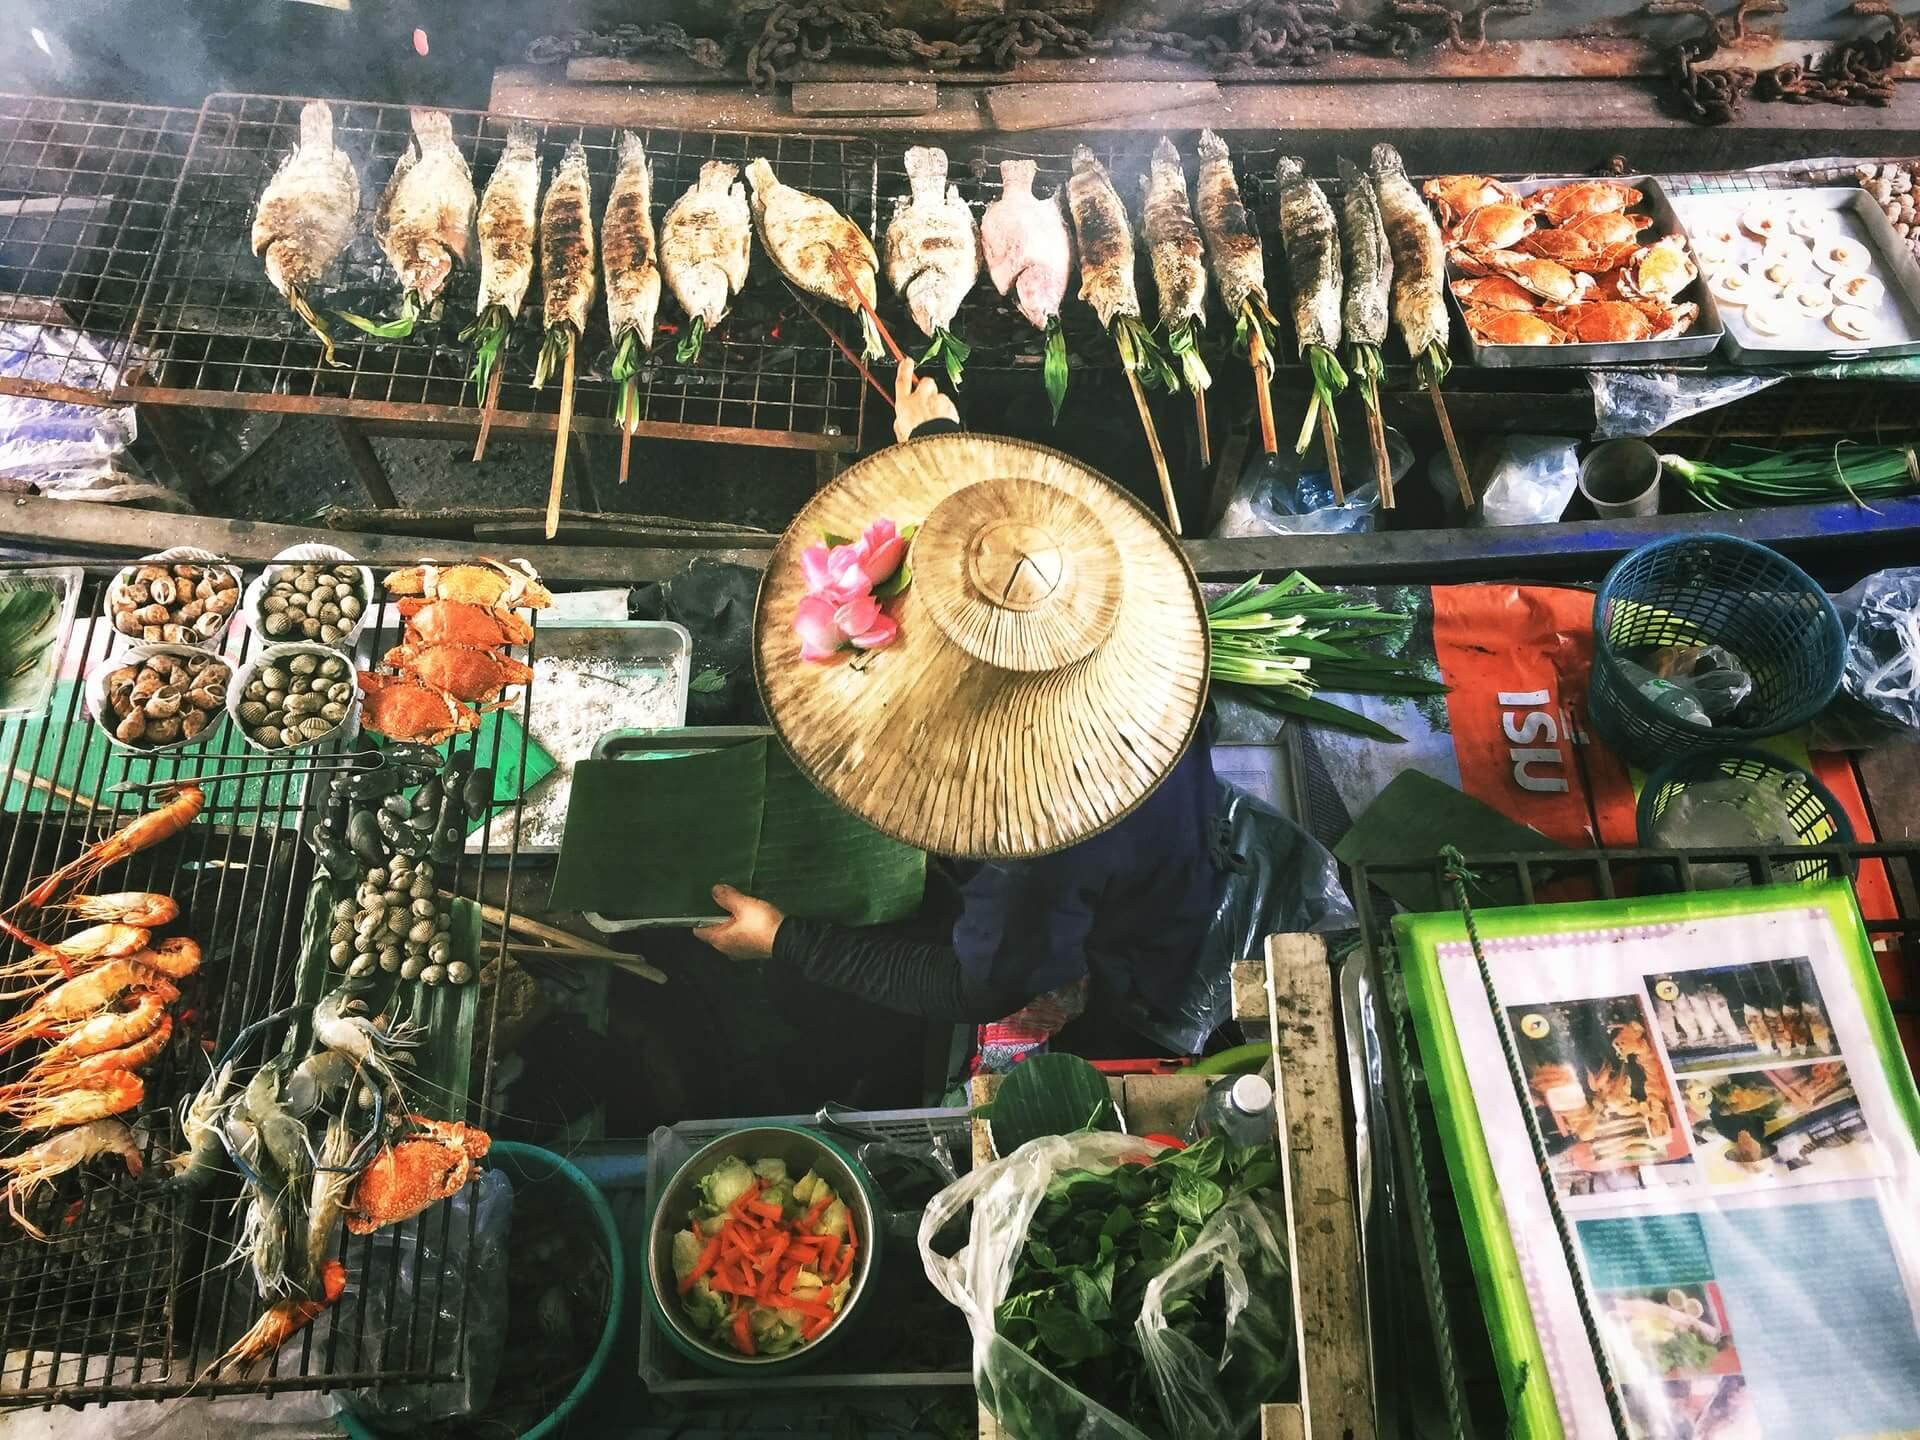 An amazing street food spread in Bangkok, Thailand